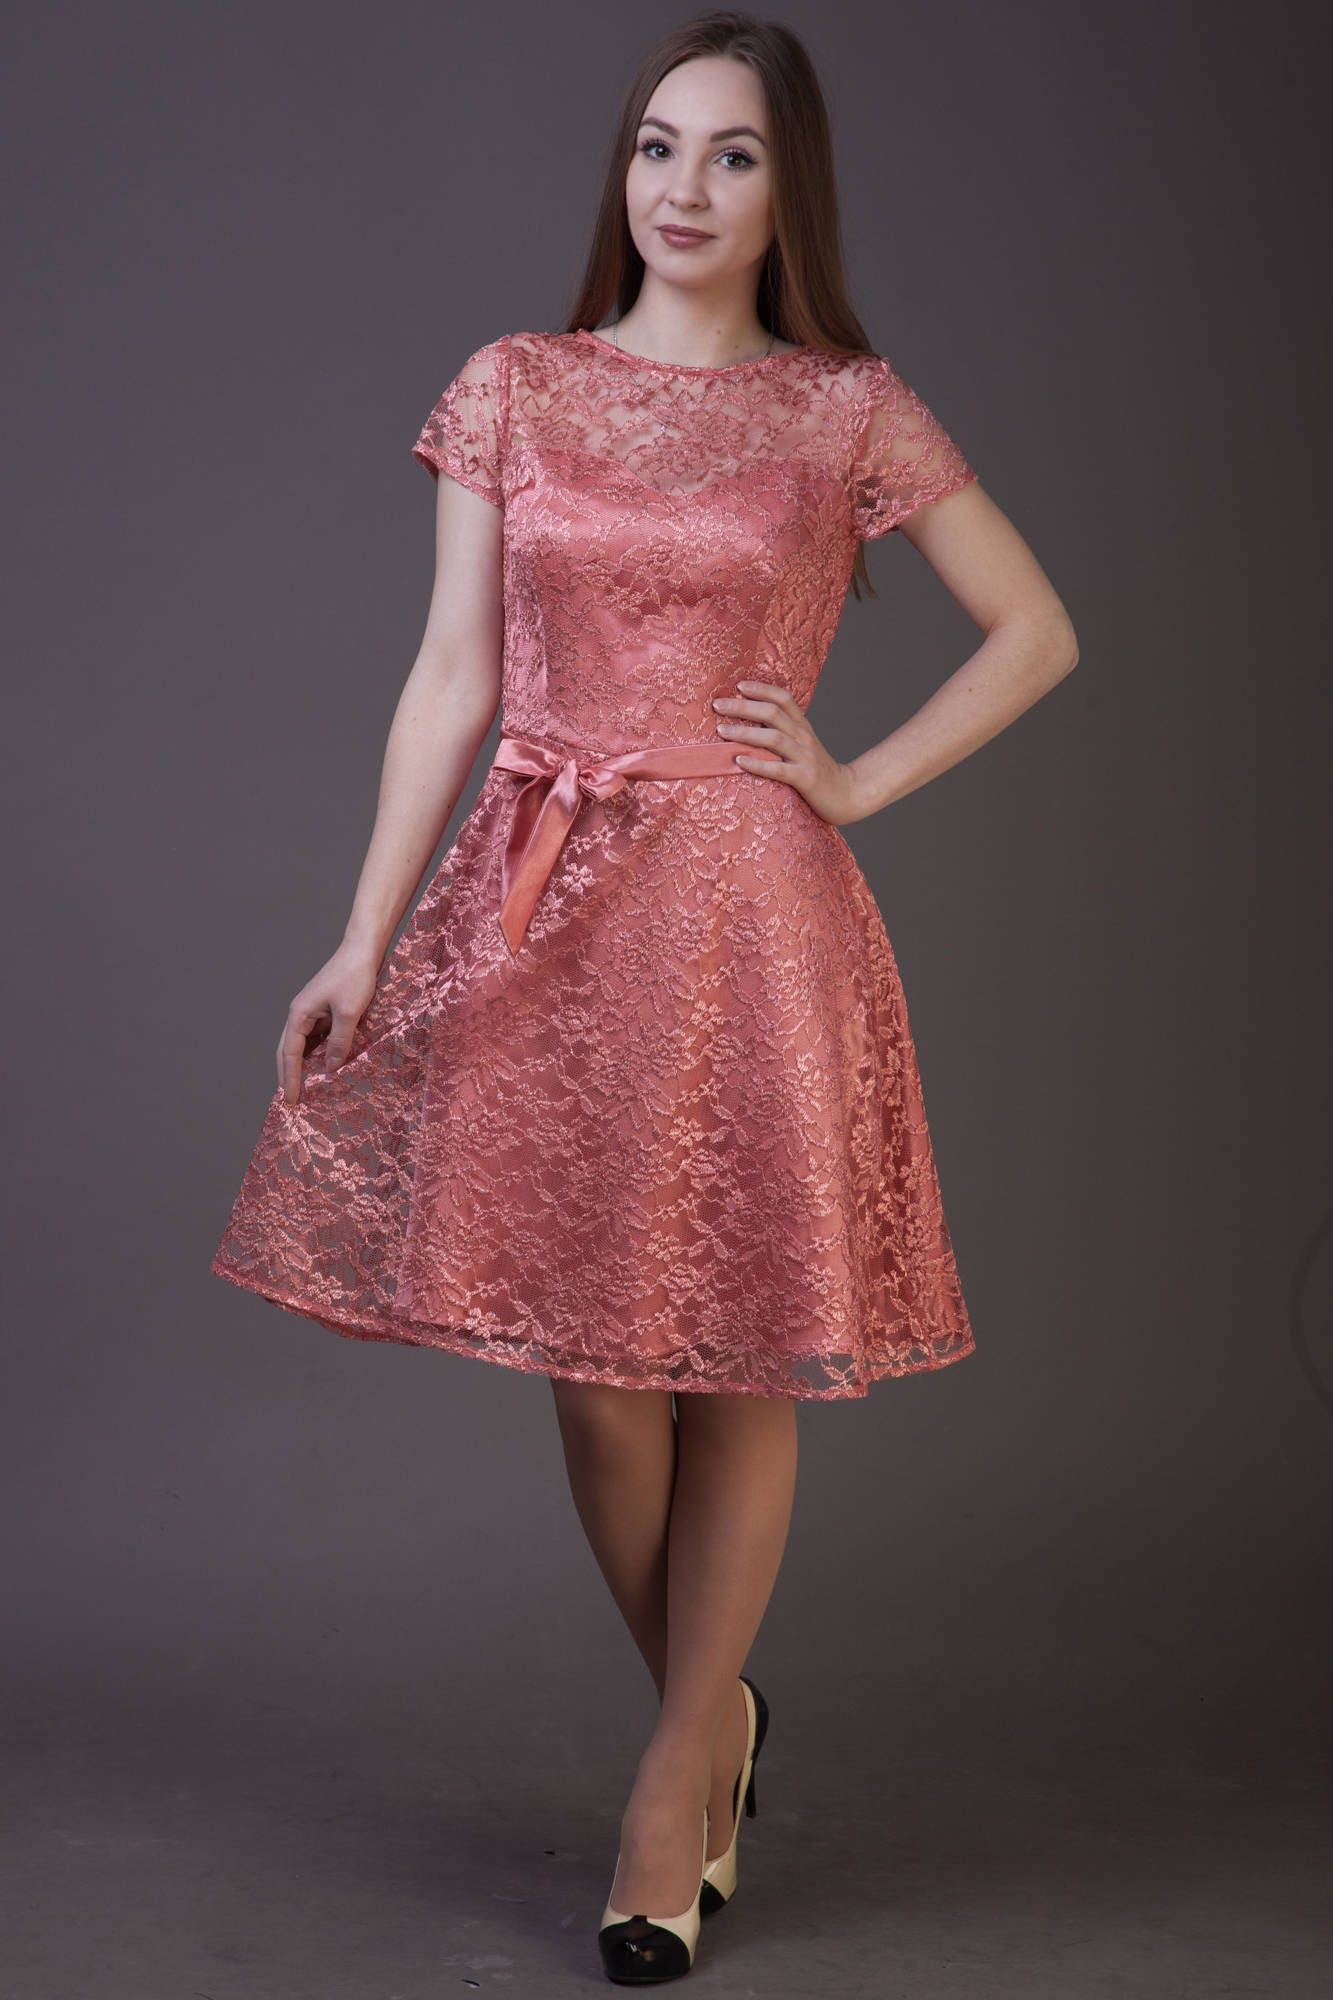 Salmon bridesmaid dress Salmon lace dress Dusty coral